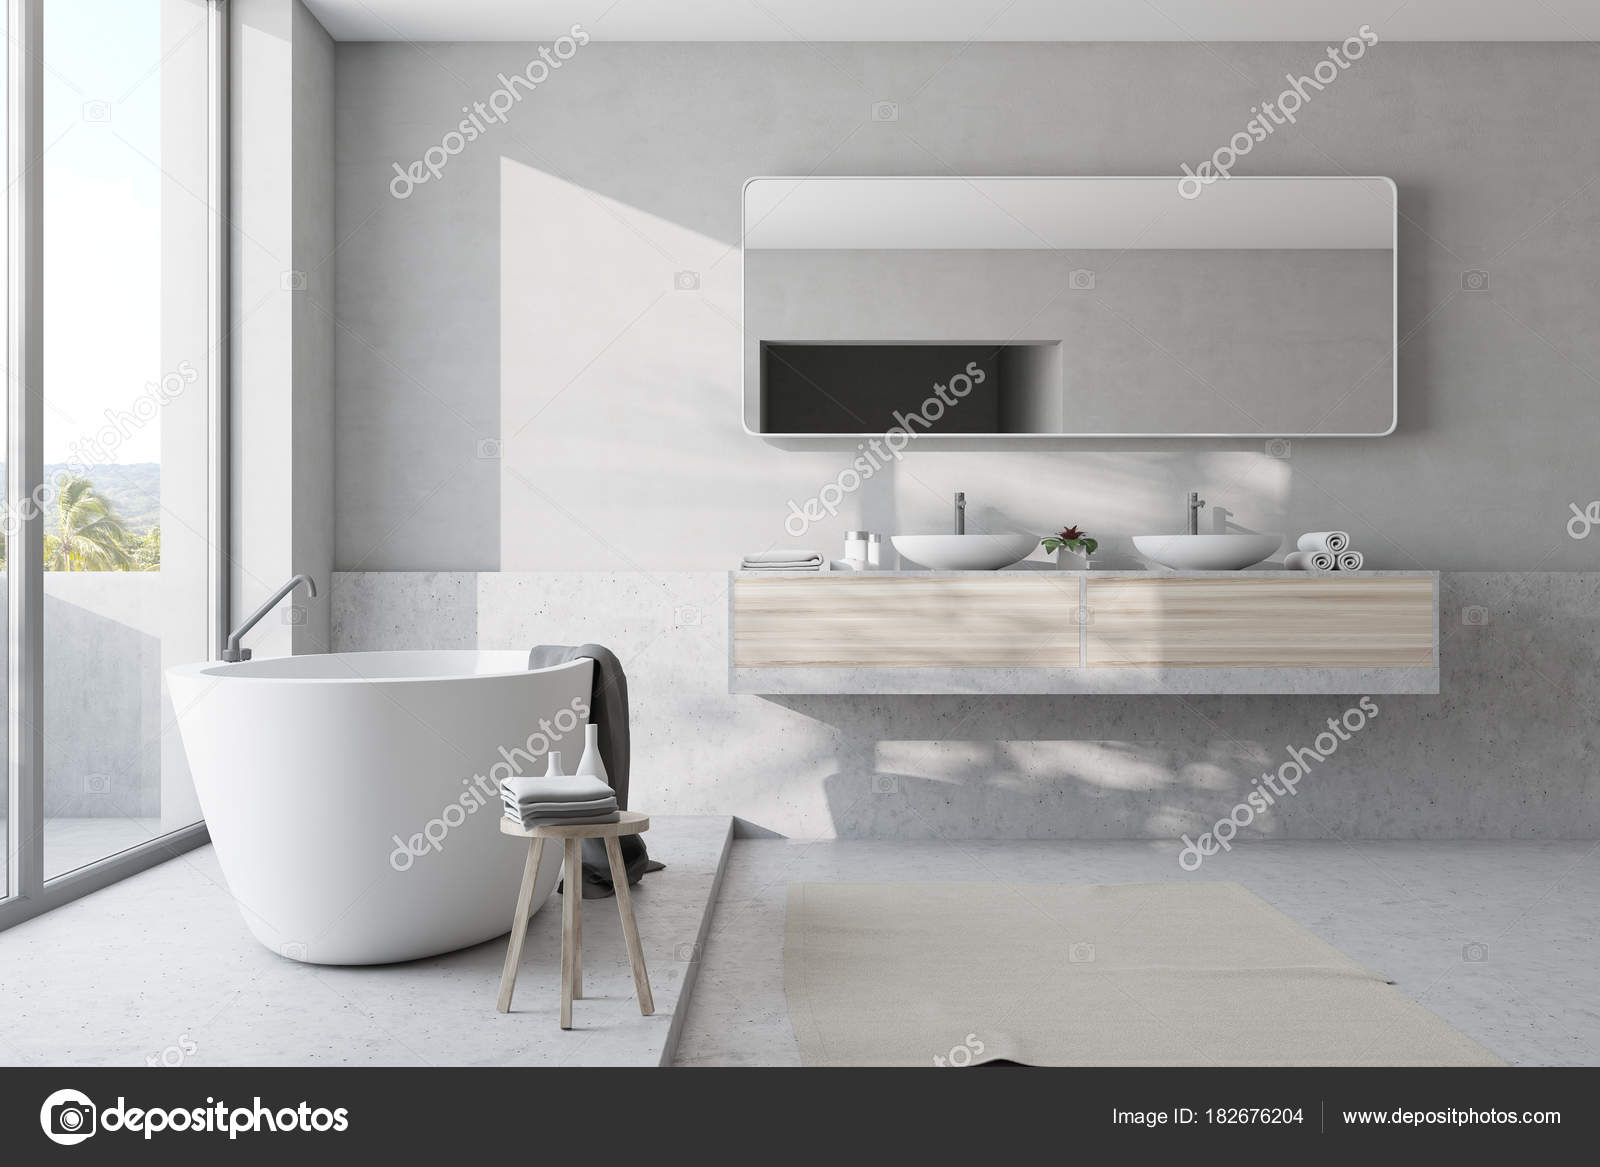 Witte Badkamer Wastafel : Witte badkamer badkuip en wastafel u stockfoto denisismagilov